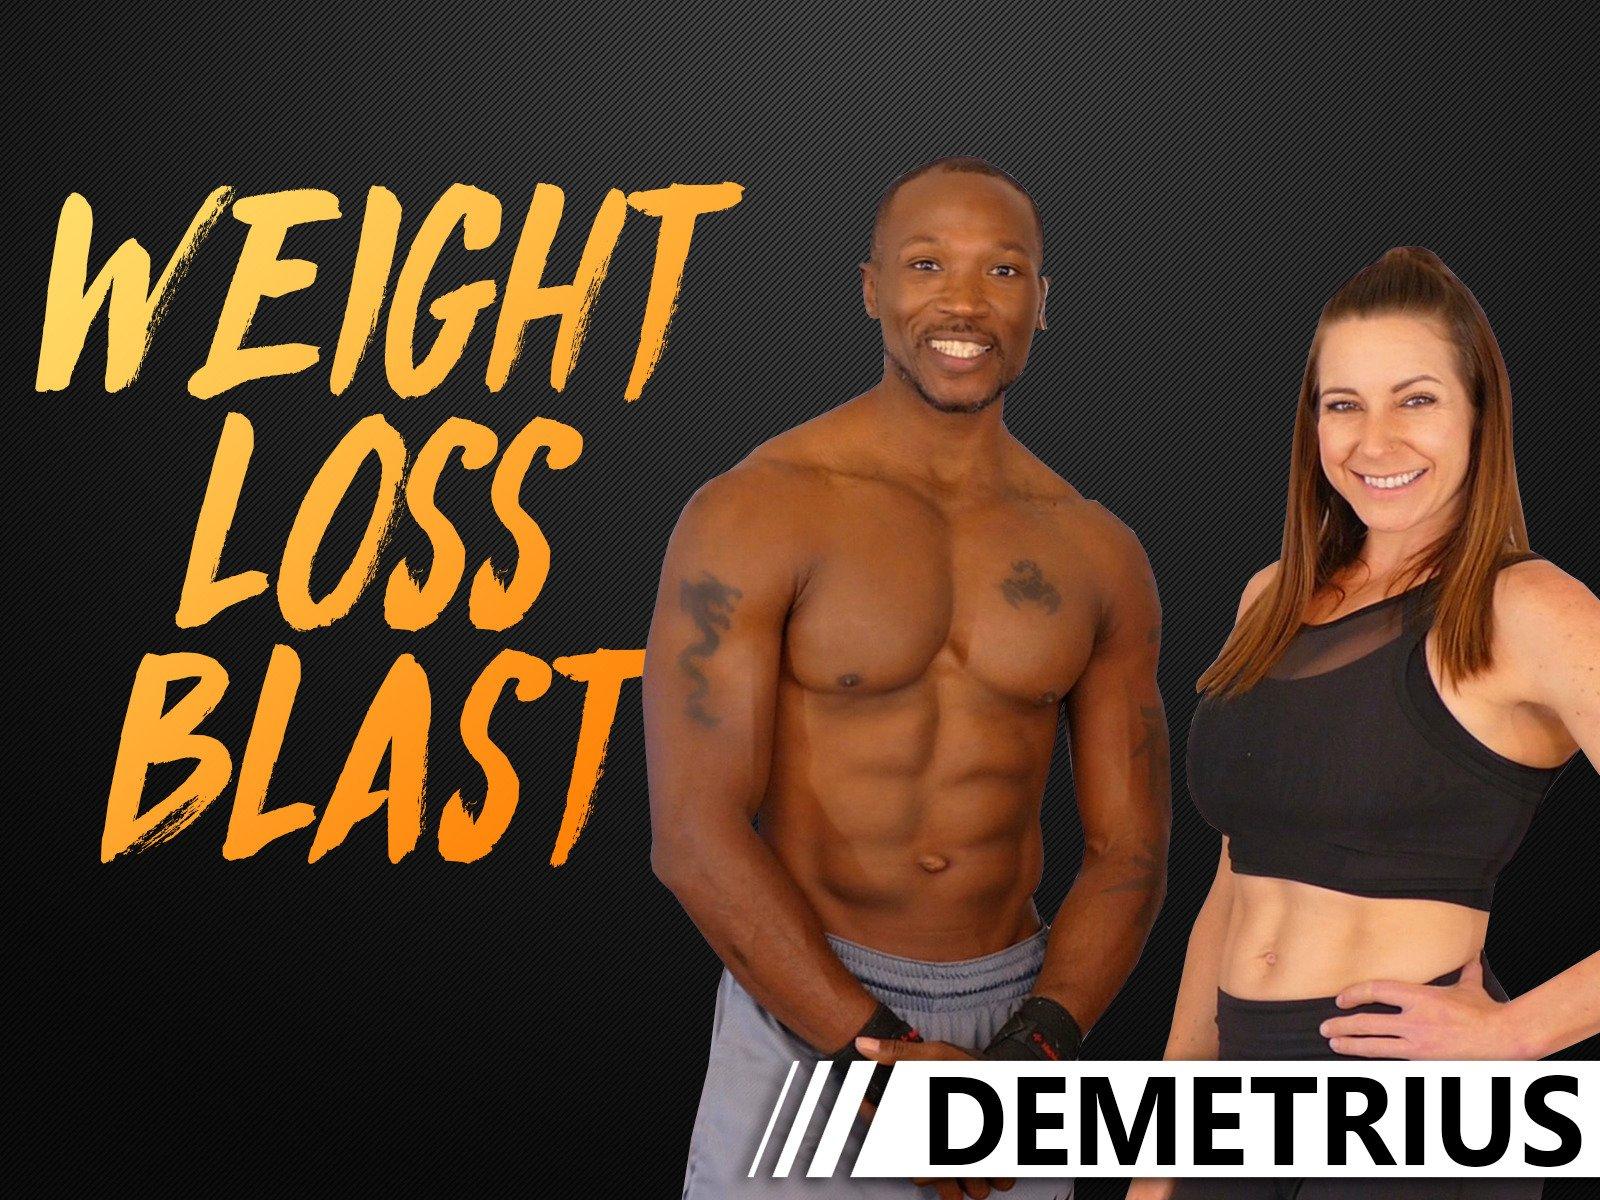 Weight Loss Blast - Demetrius - Season 1